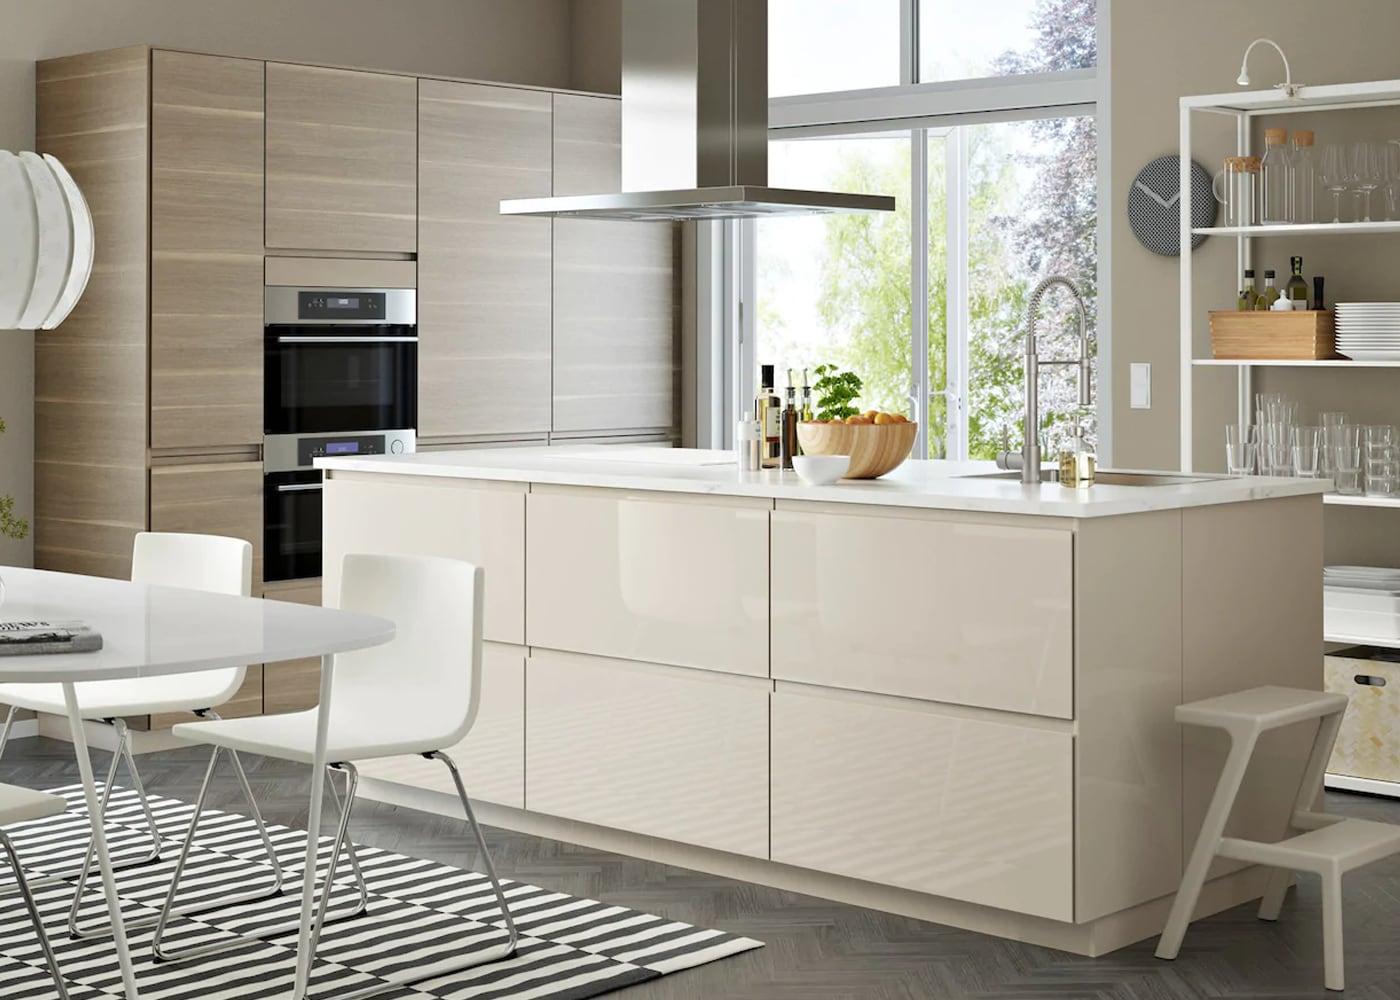 Höhe Ikea Küche